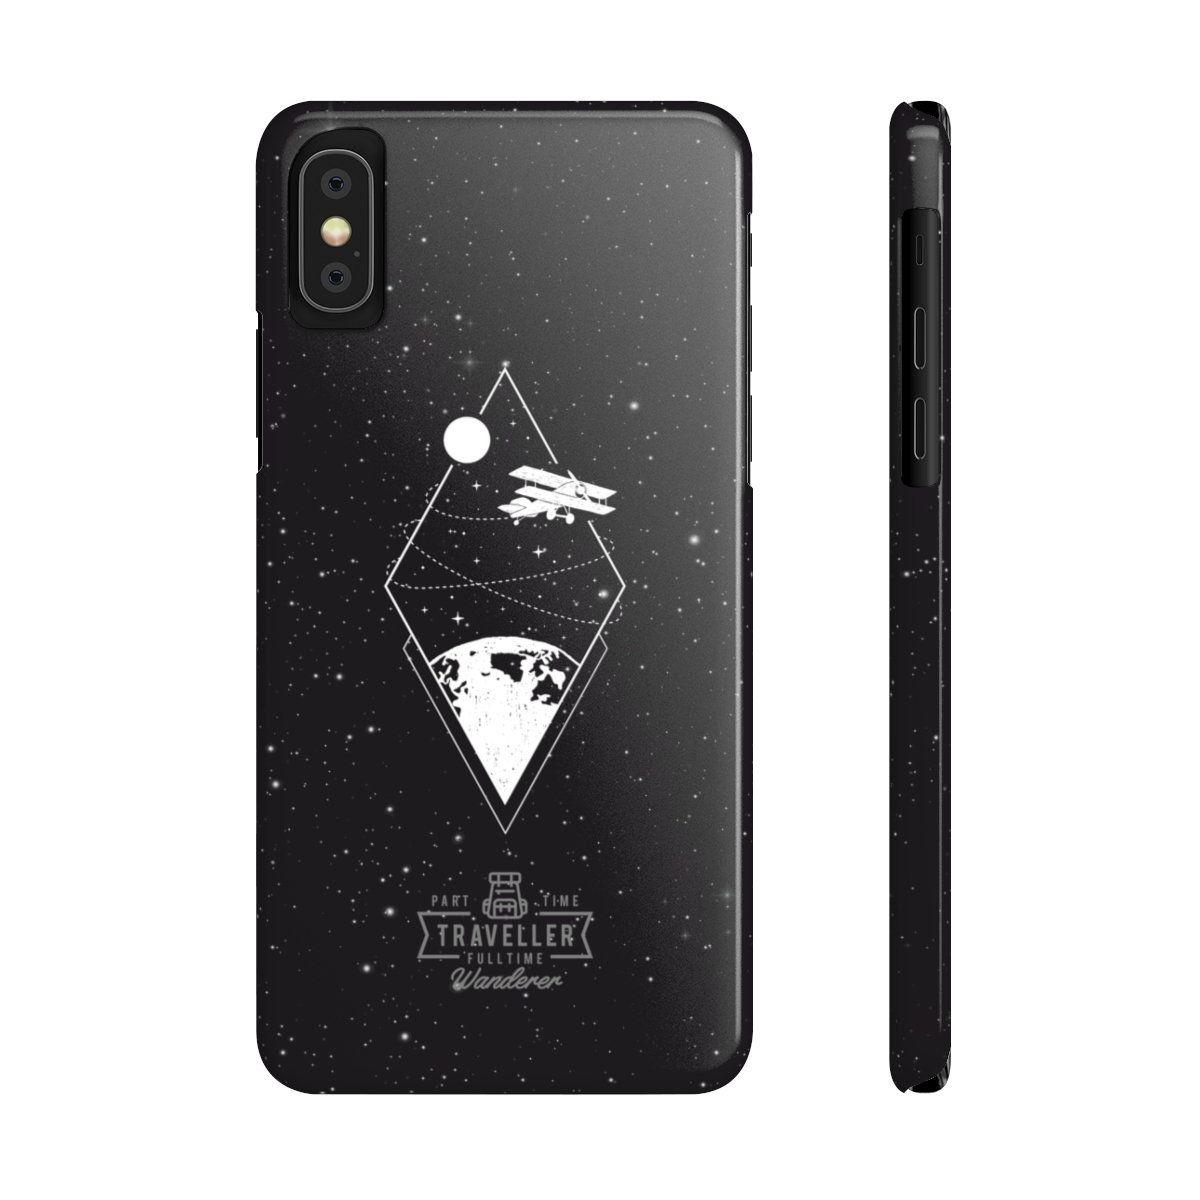 Traveler Amp Wanderer Unique Phone Case Cell Phone